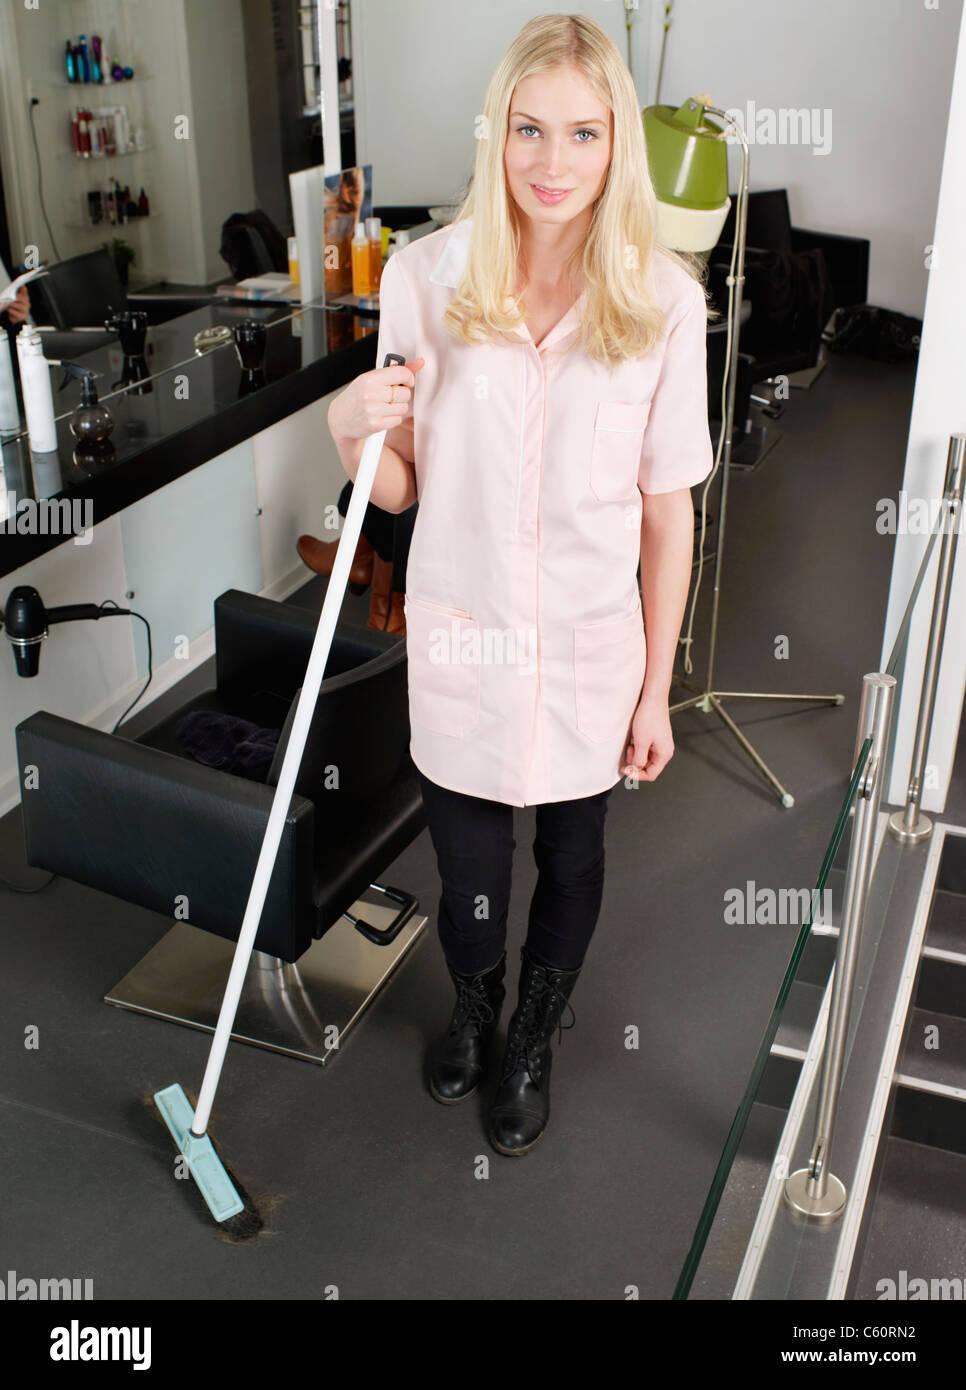 Hairdresser holding broom in salon - Stock Image